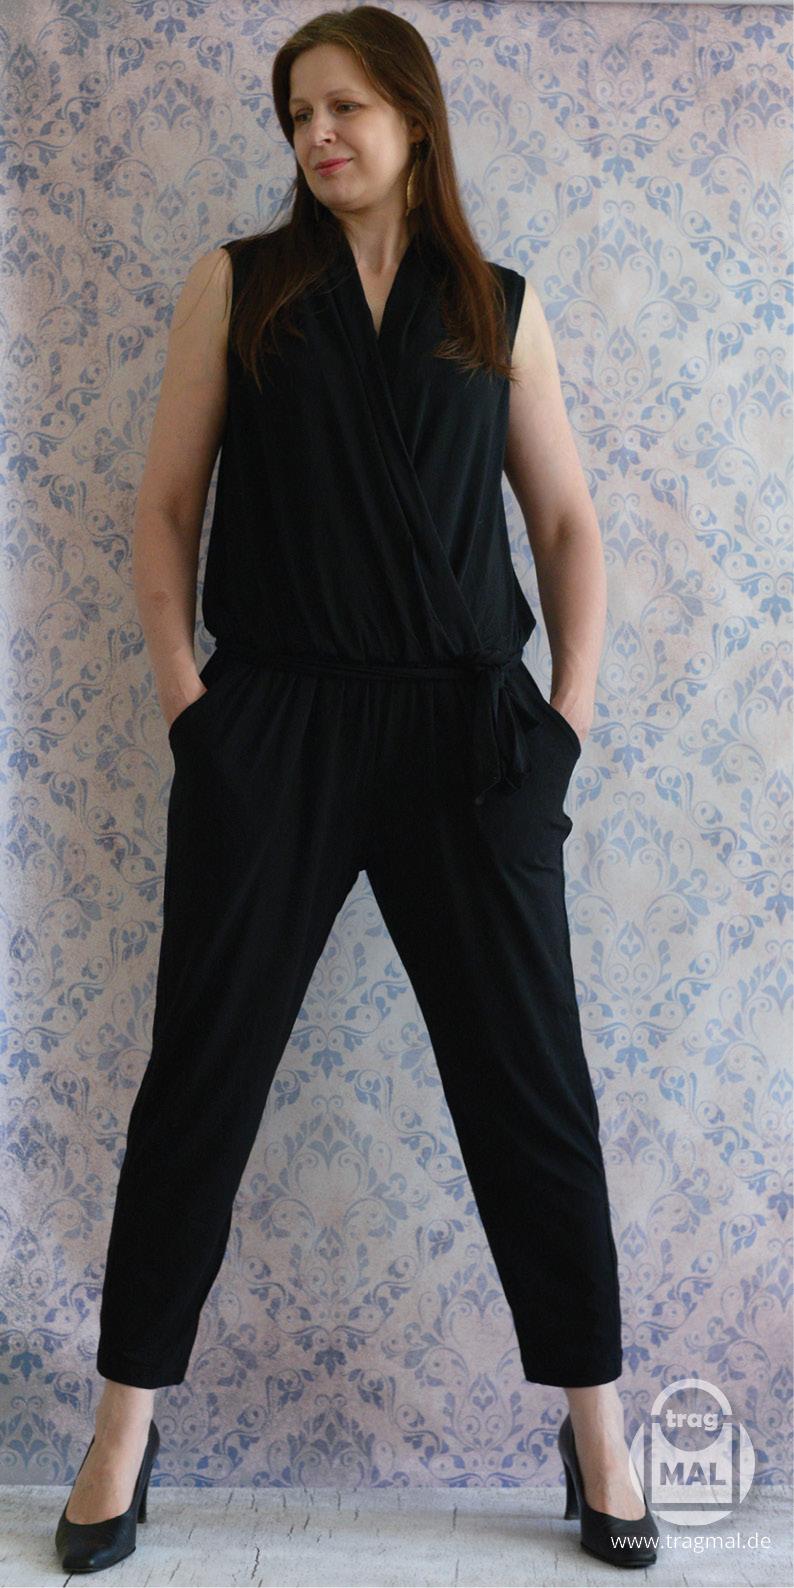 tragmal-overall-jumpsuit